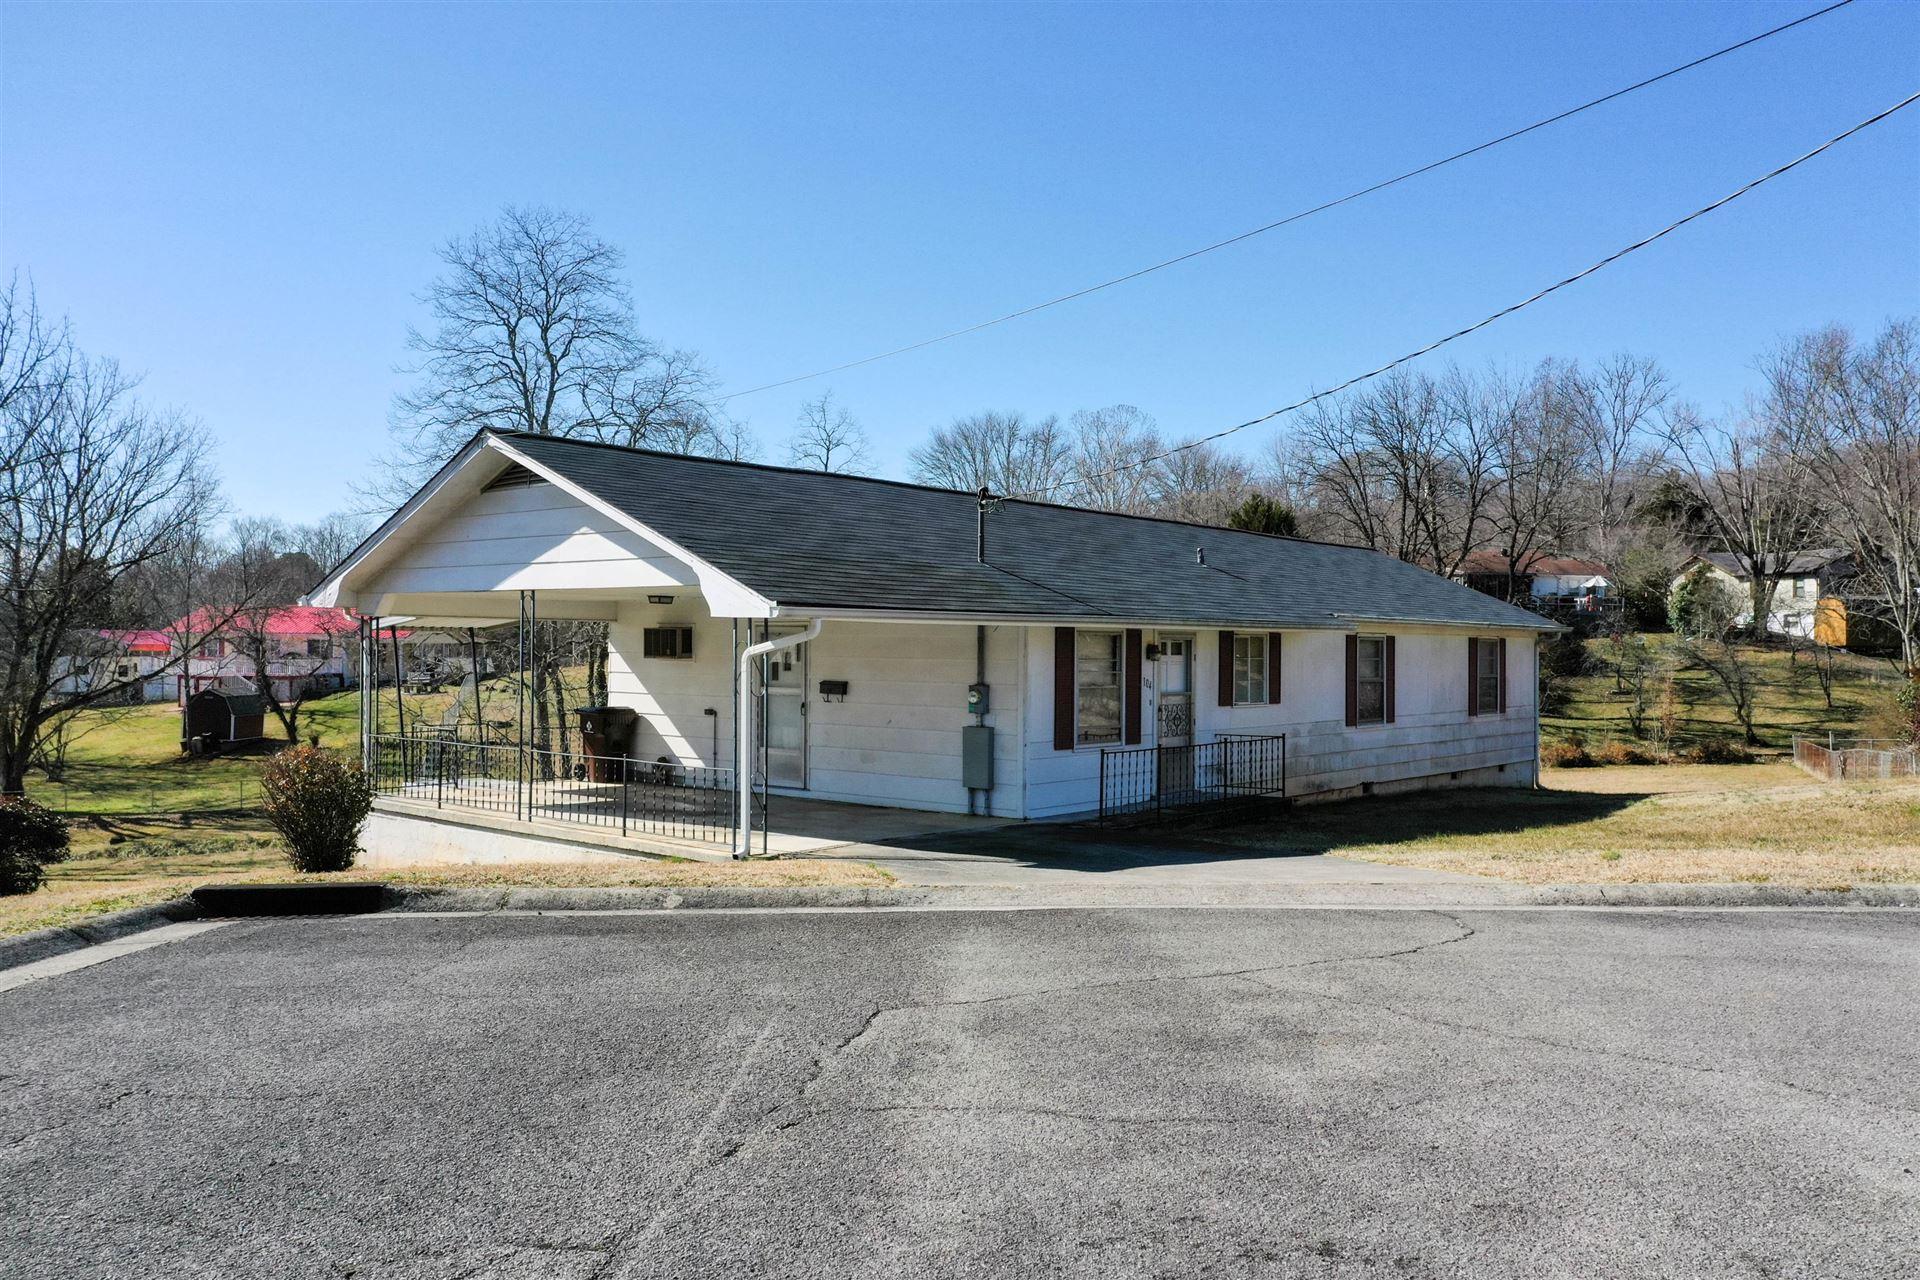 Photo of 104 W Sheridan Place, Oak Ridge, TN 37830 (MLS # 1143083)